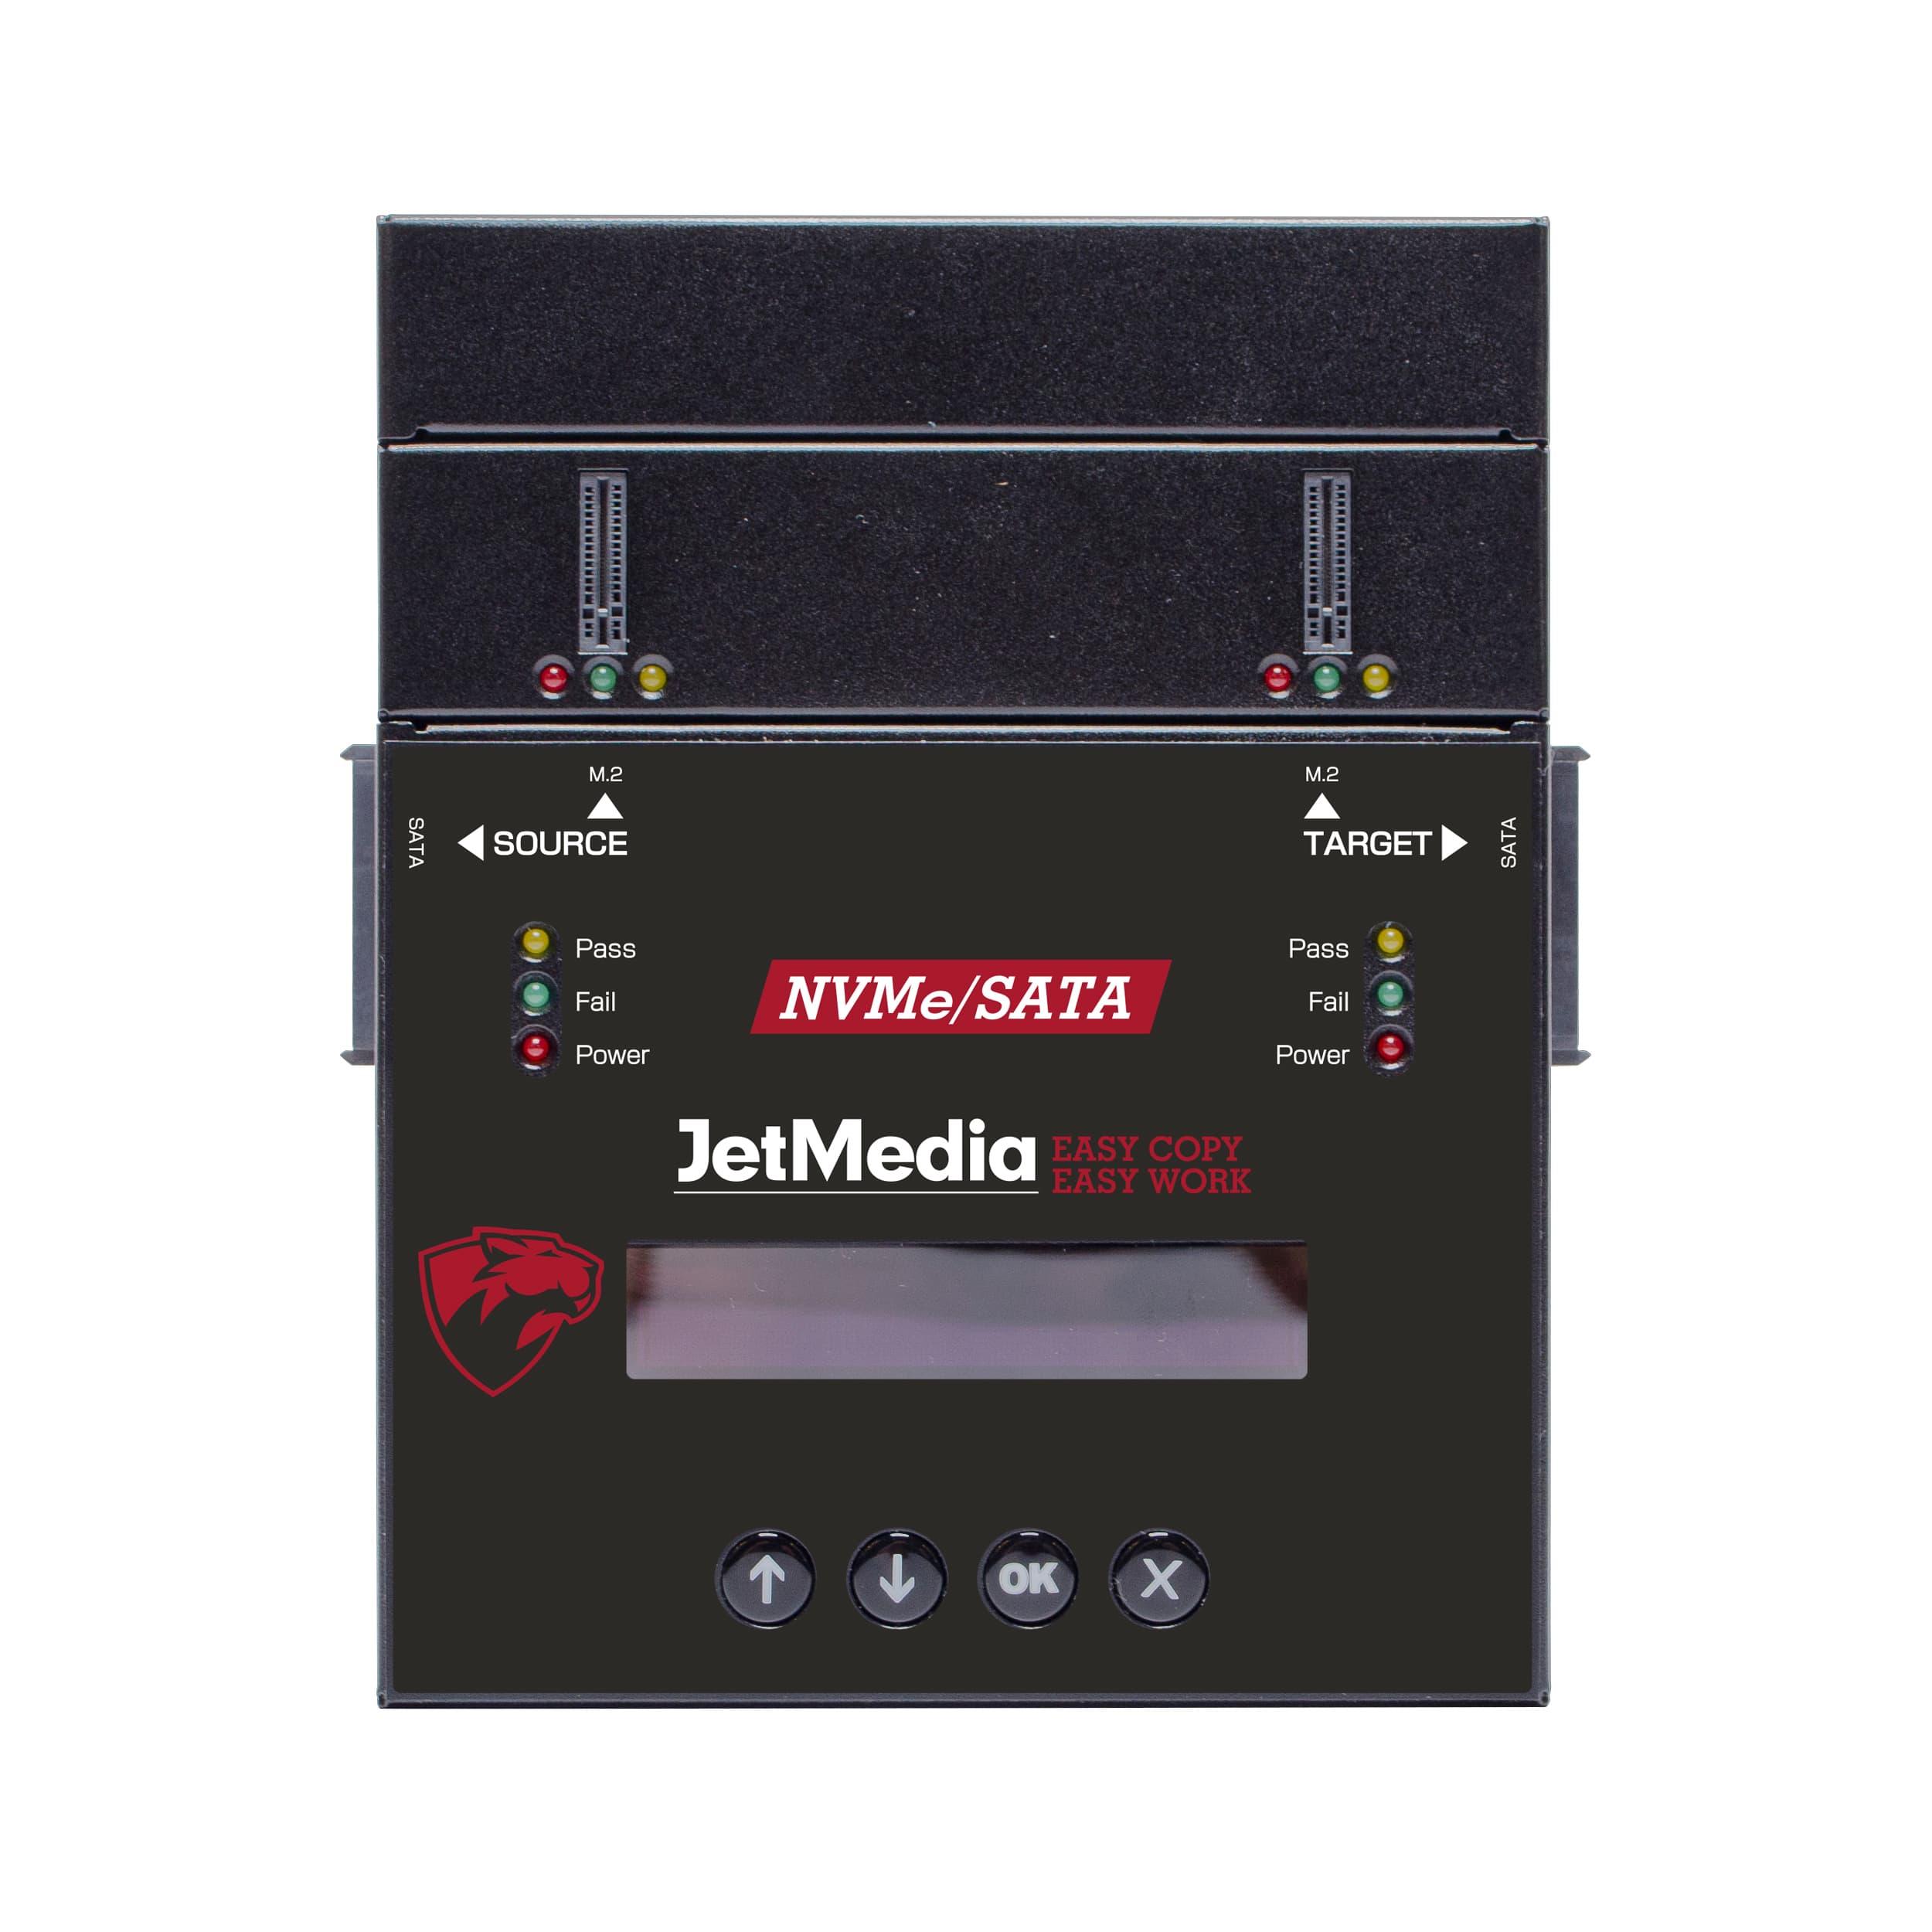 M2 NVMe SSD PC-Link Duplicator JetMedia NV281 SATA M2 Cross-Interface PC-Link Duplicator HDD/SSD copier